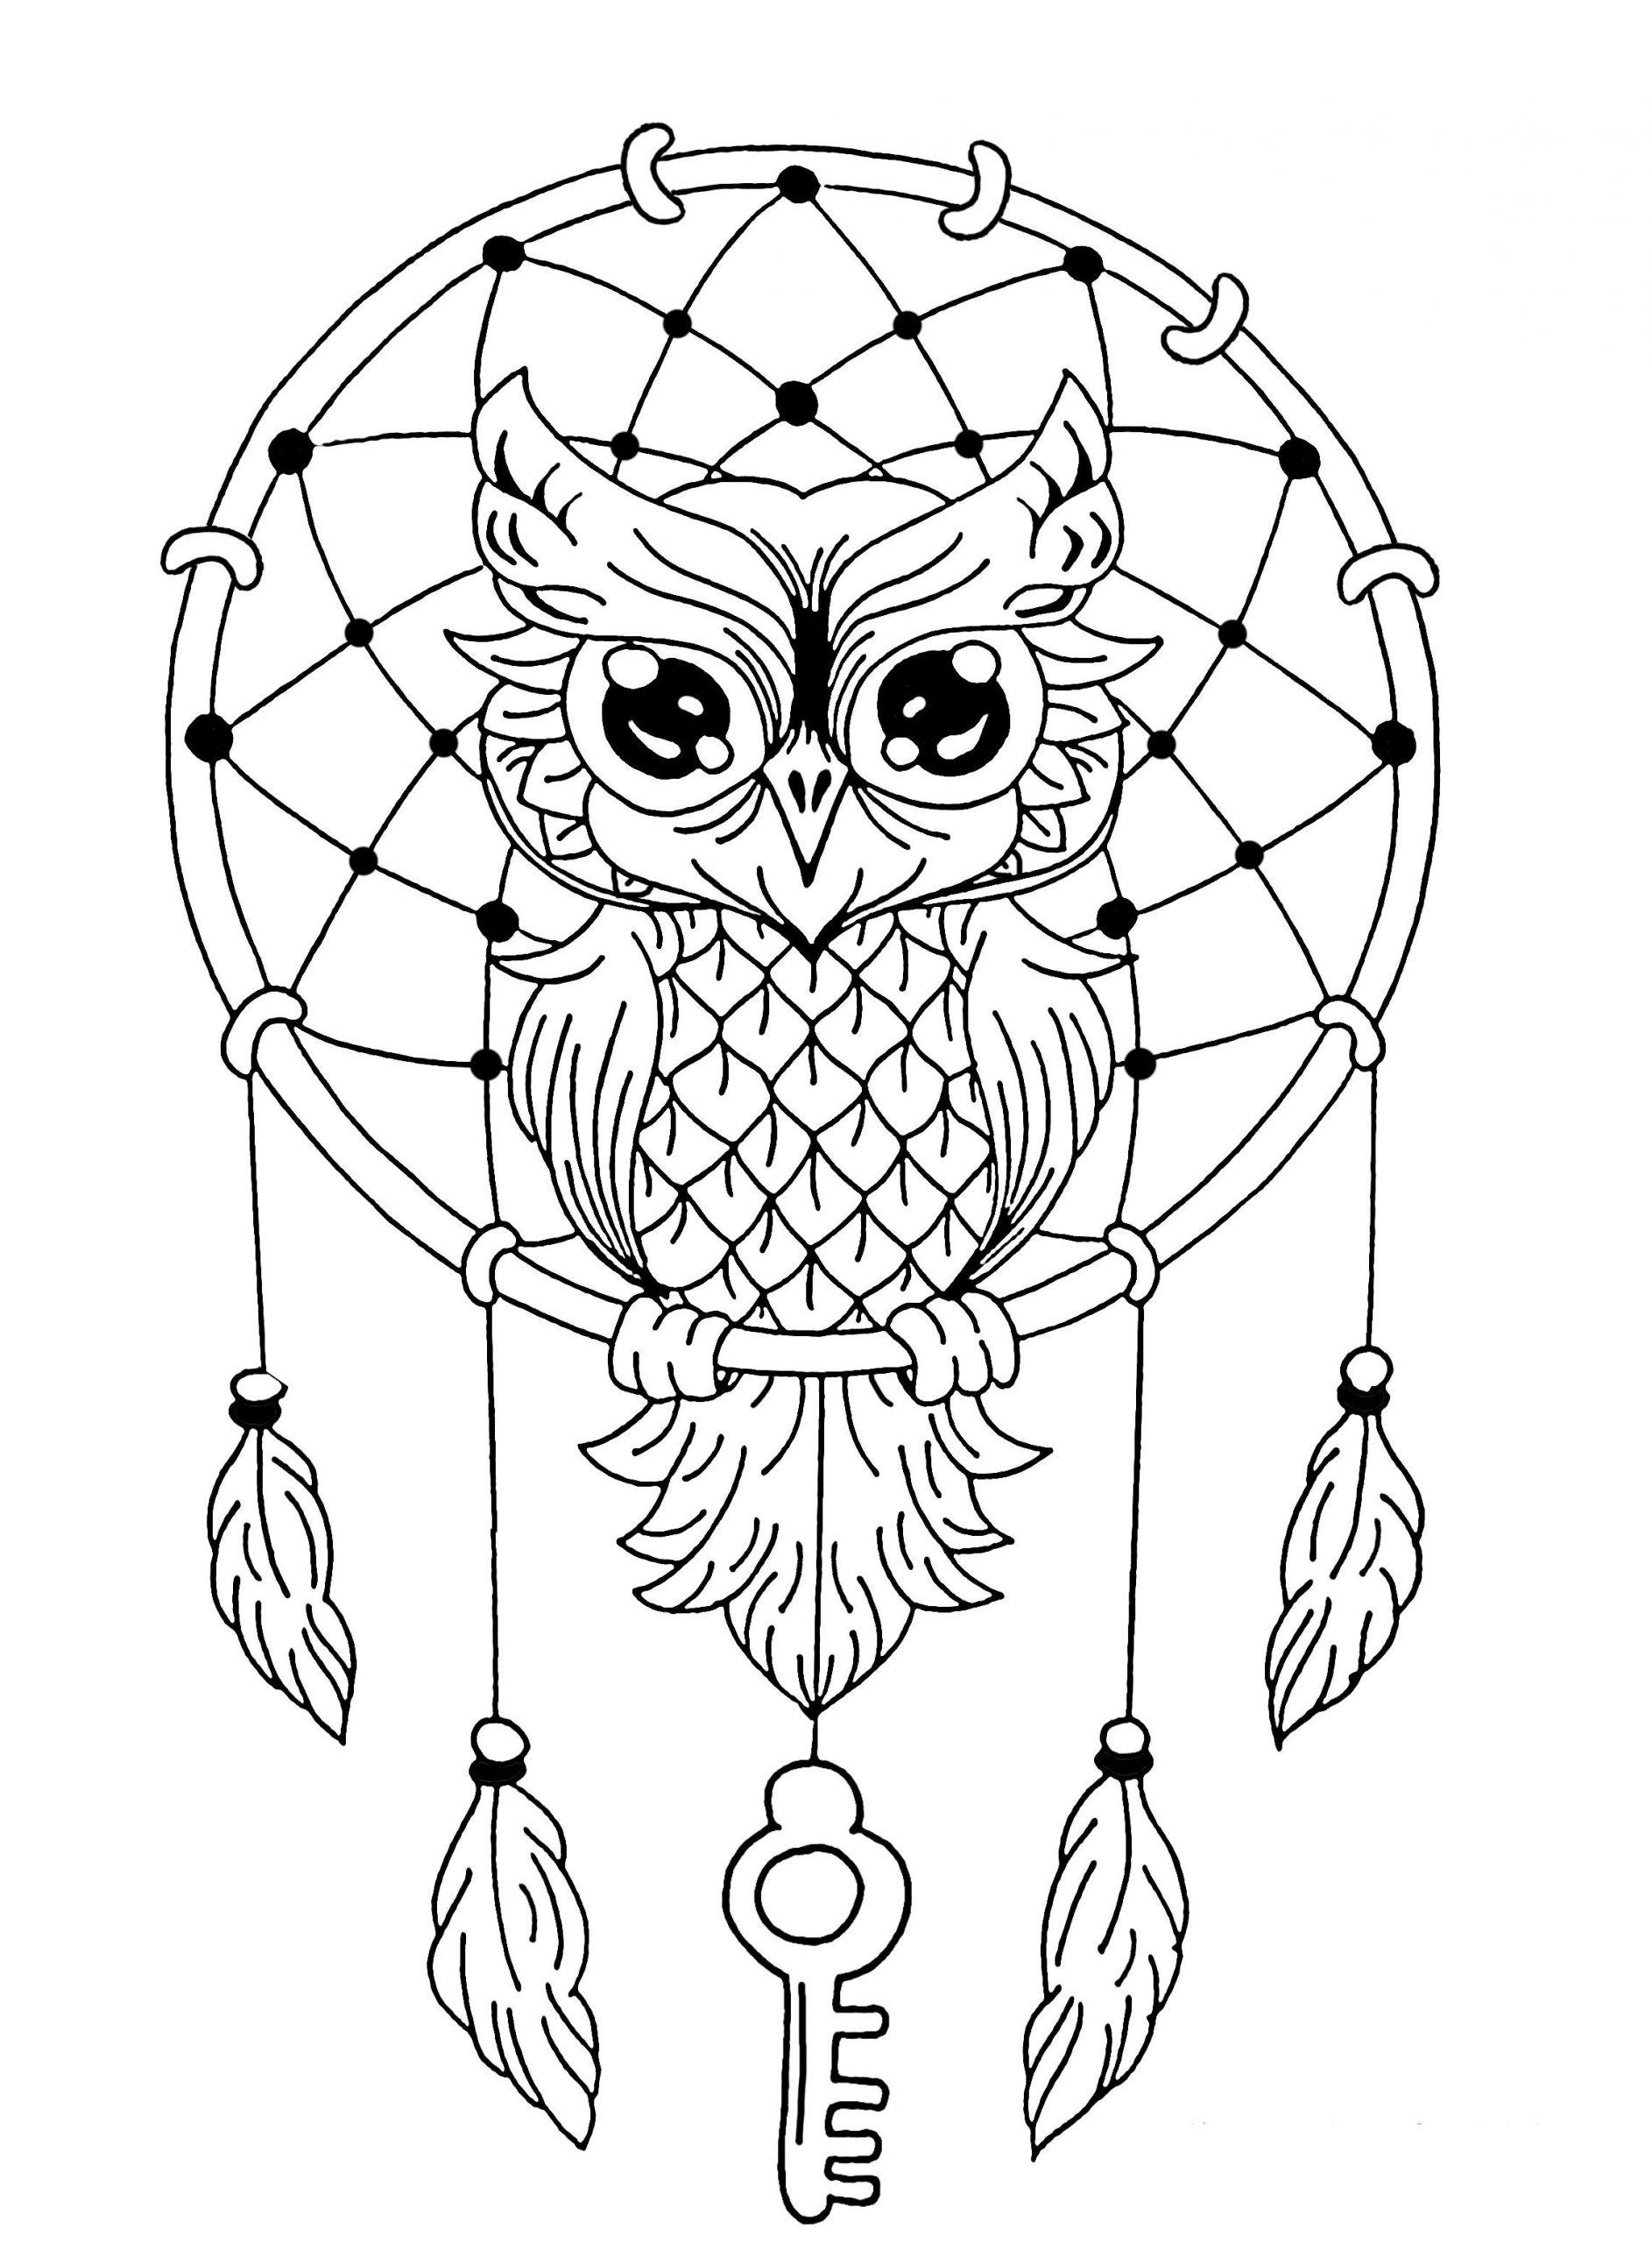 Épinglé Par Monča Eichenbaumová Sur Owl Omalovánky destiné Hugo L Escargot Coloriage Mandala